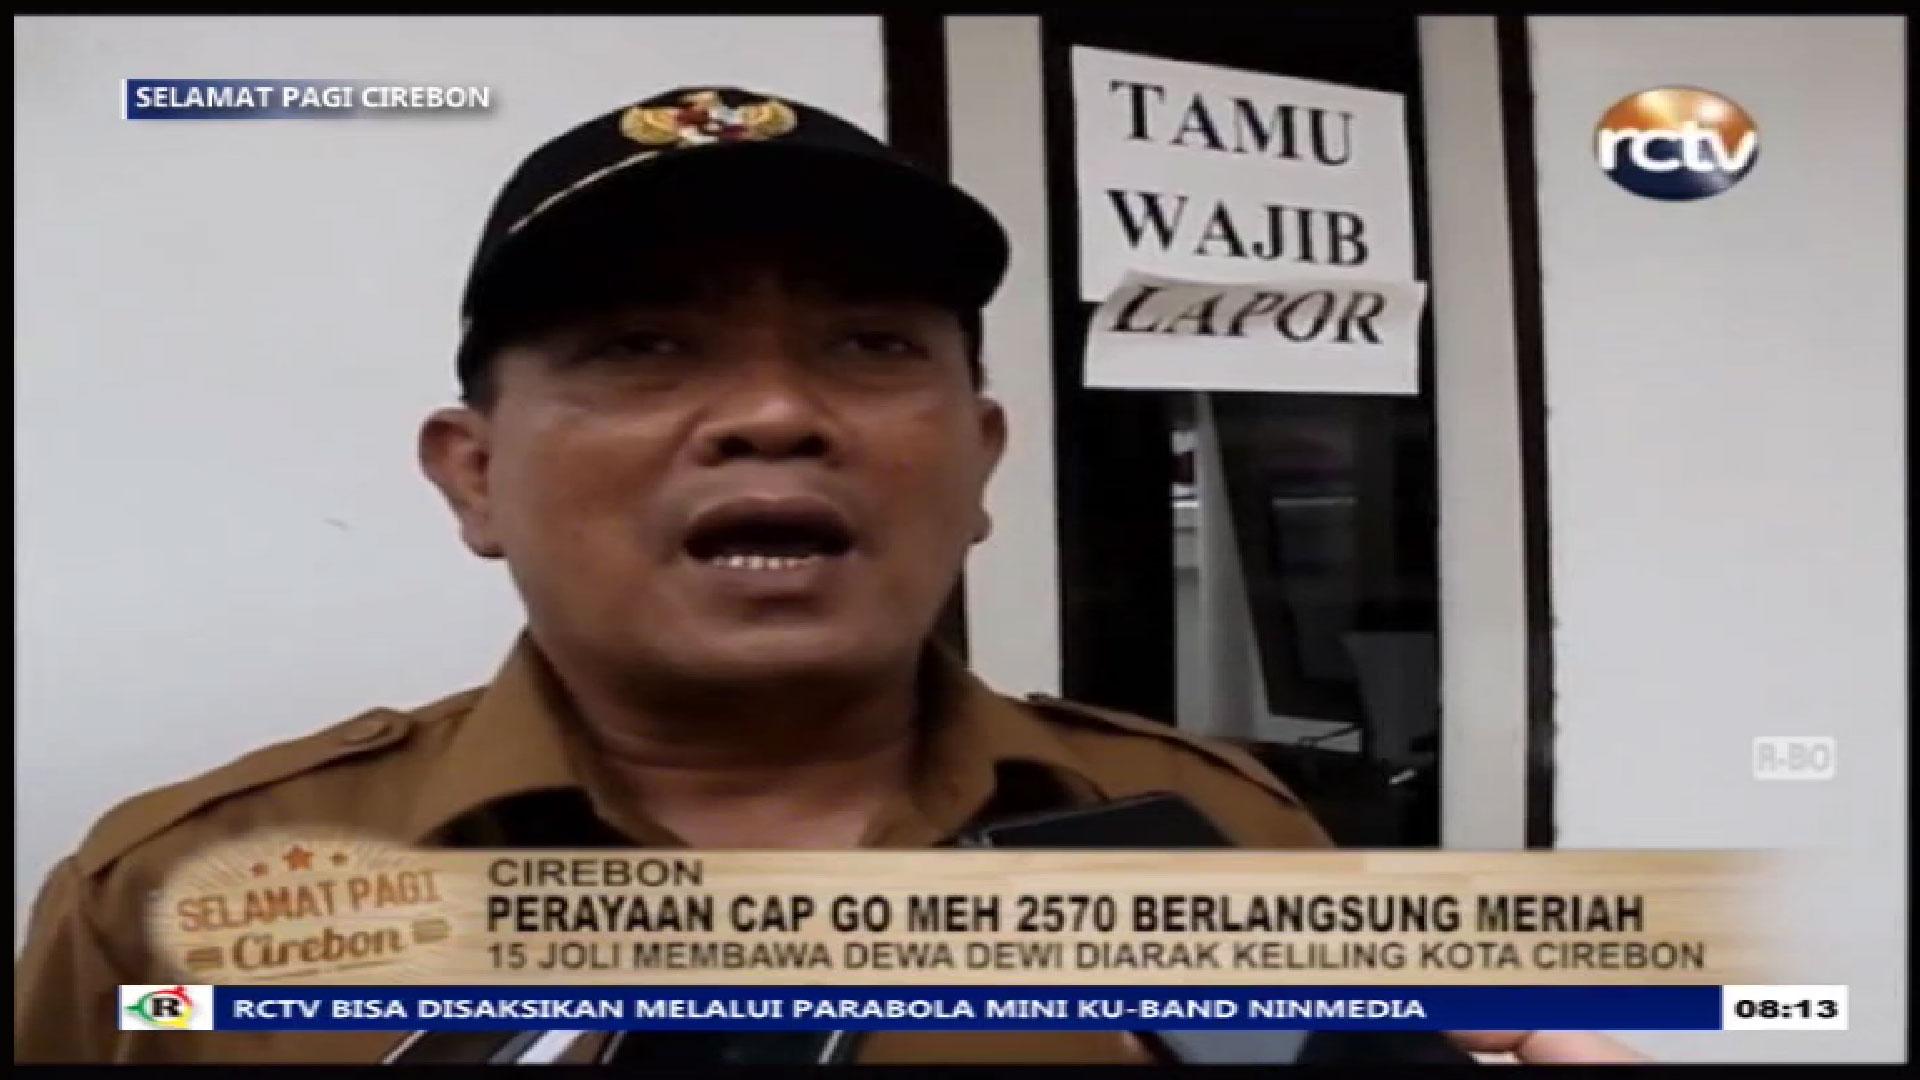 Frekuensi siaran Radar Cirebon TV di satelit ChinaSat 11 Terbaru